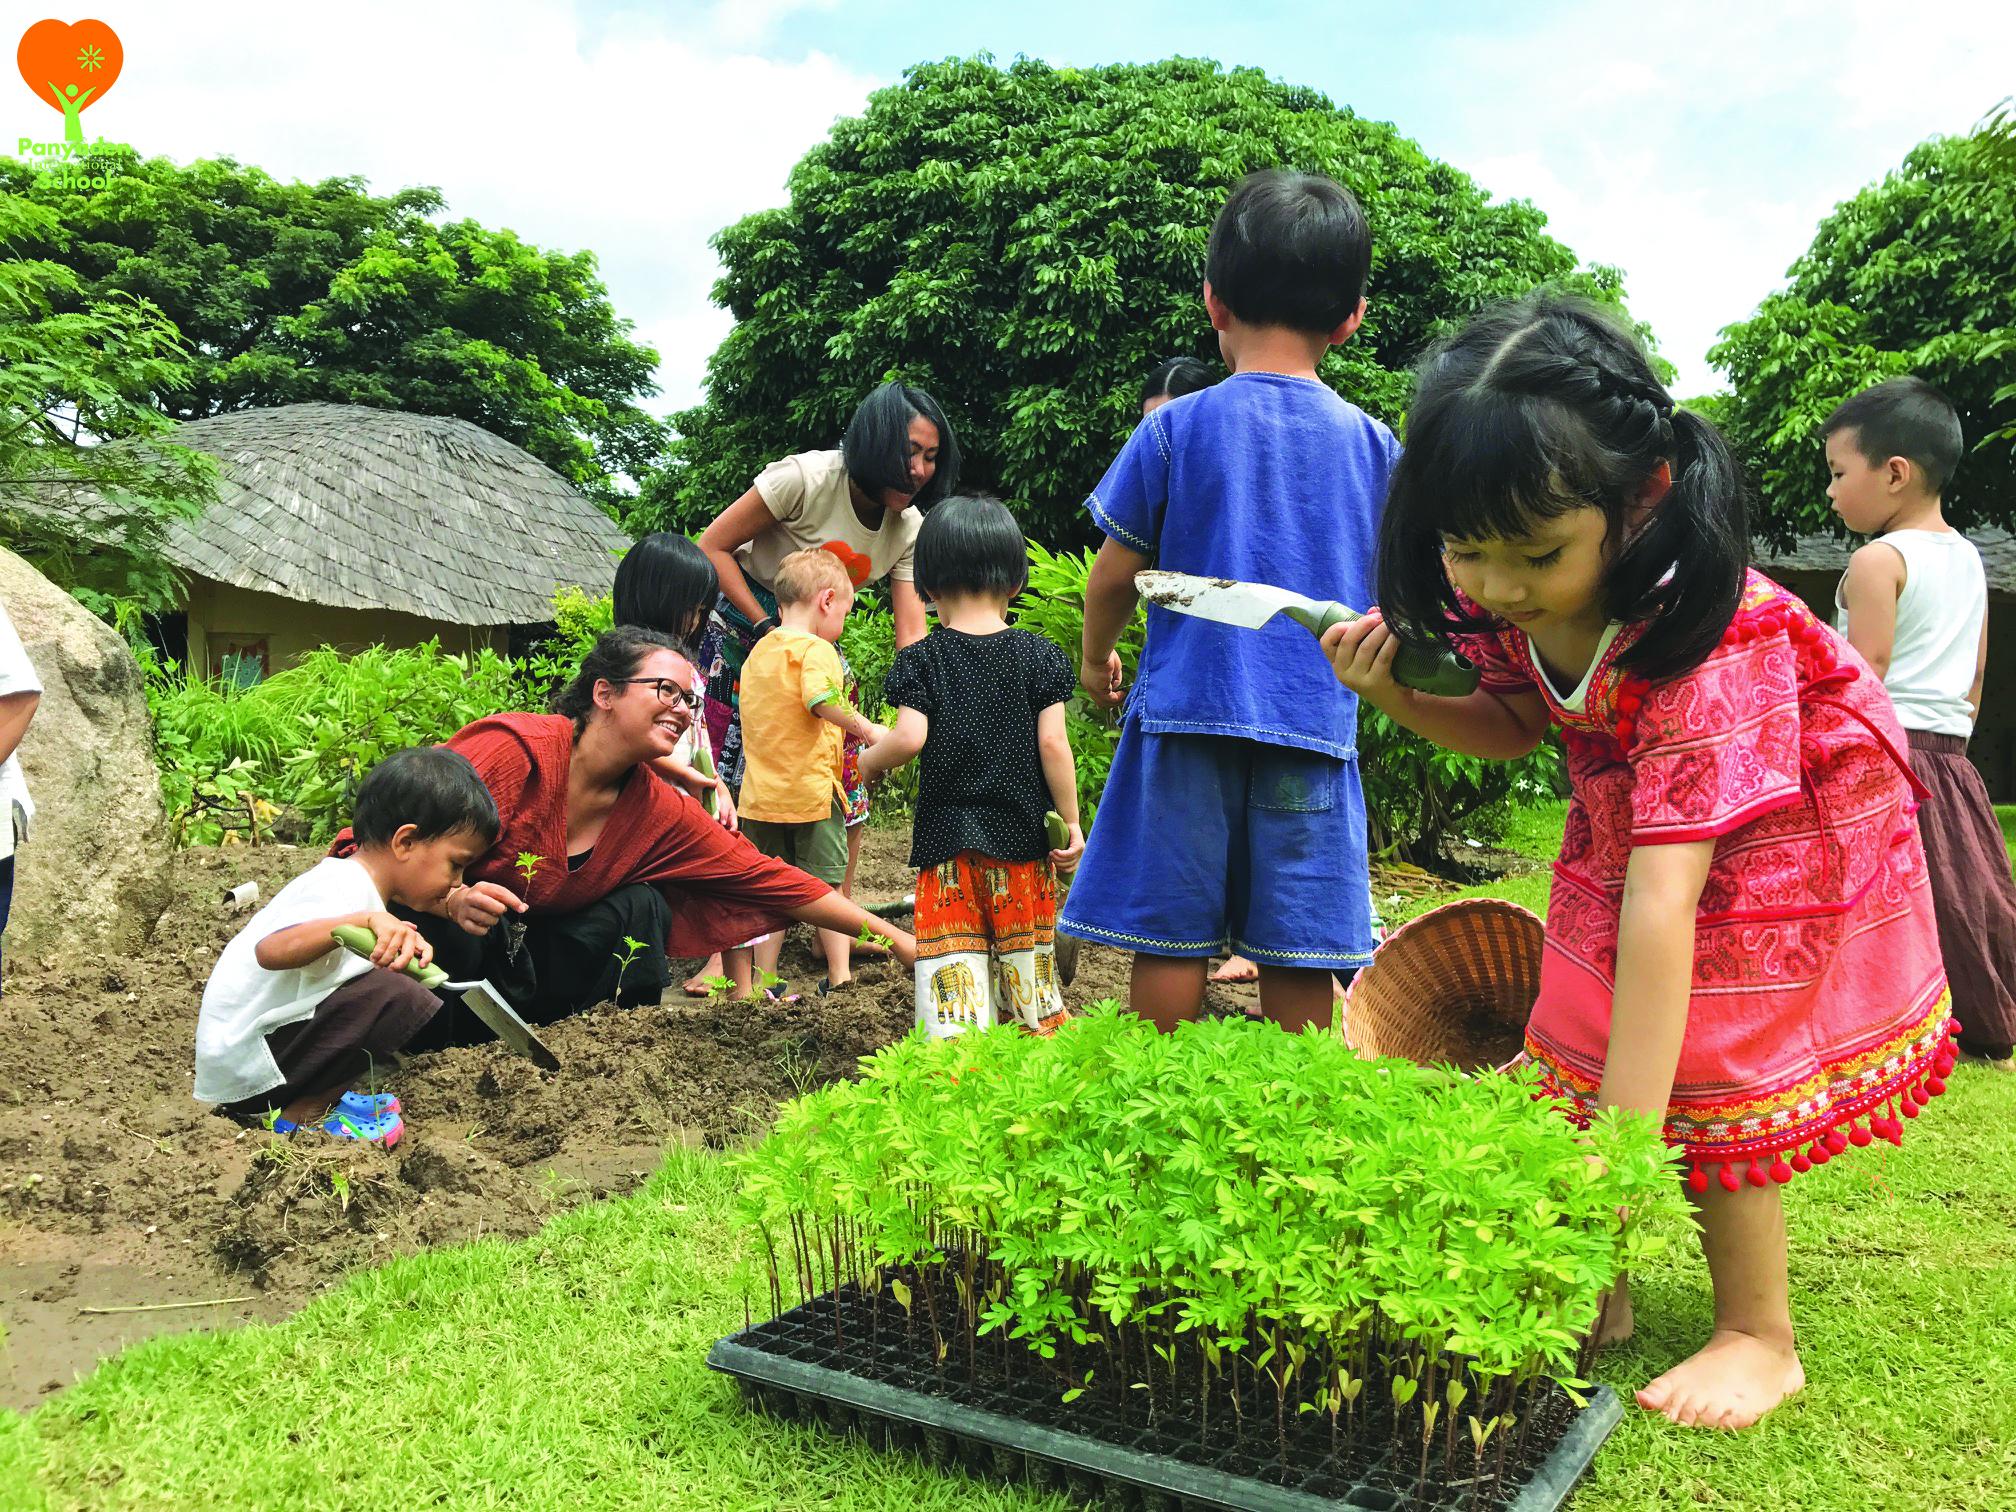 Panyaden Kindergarten 1 plant marigold flowers as a tribute to King Rama IX